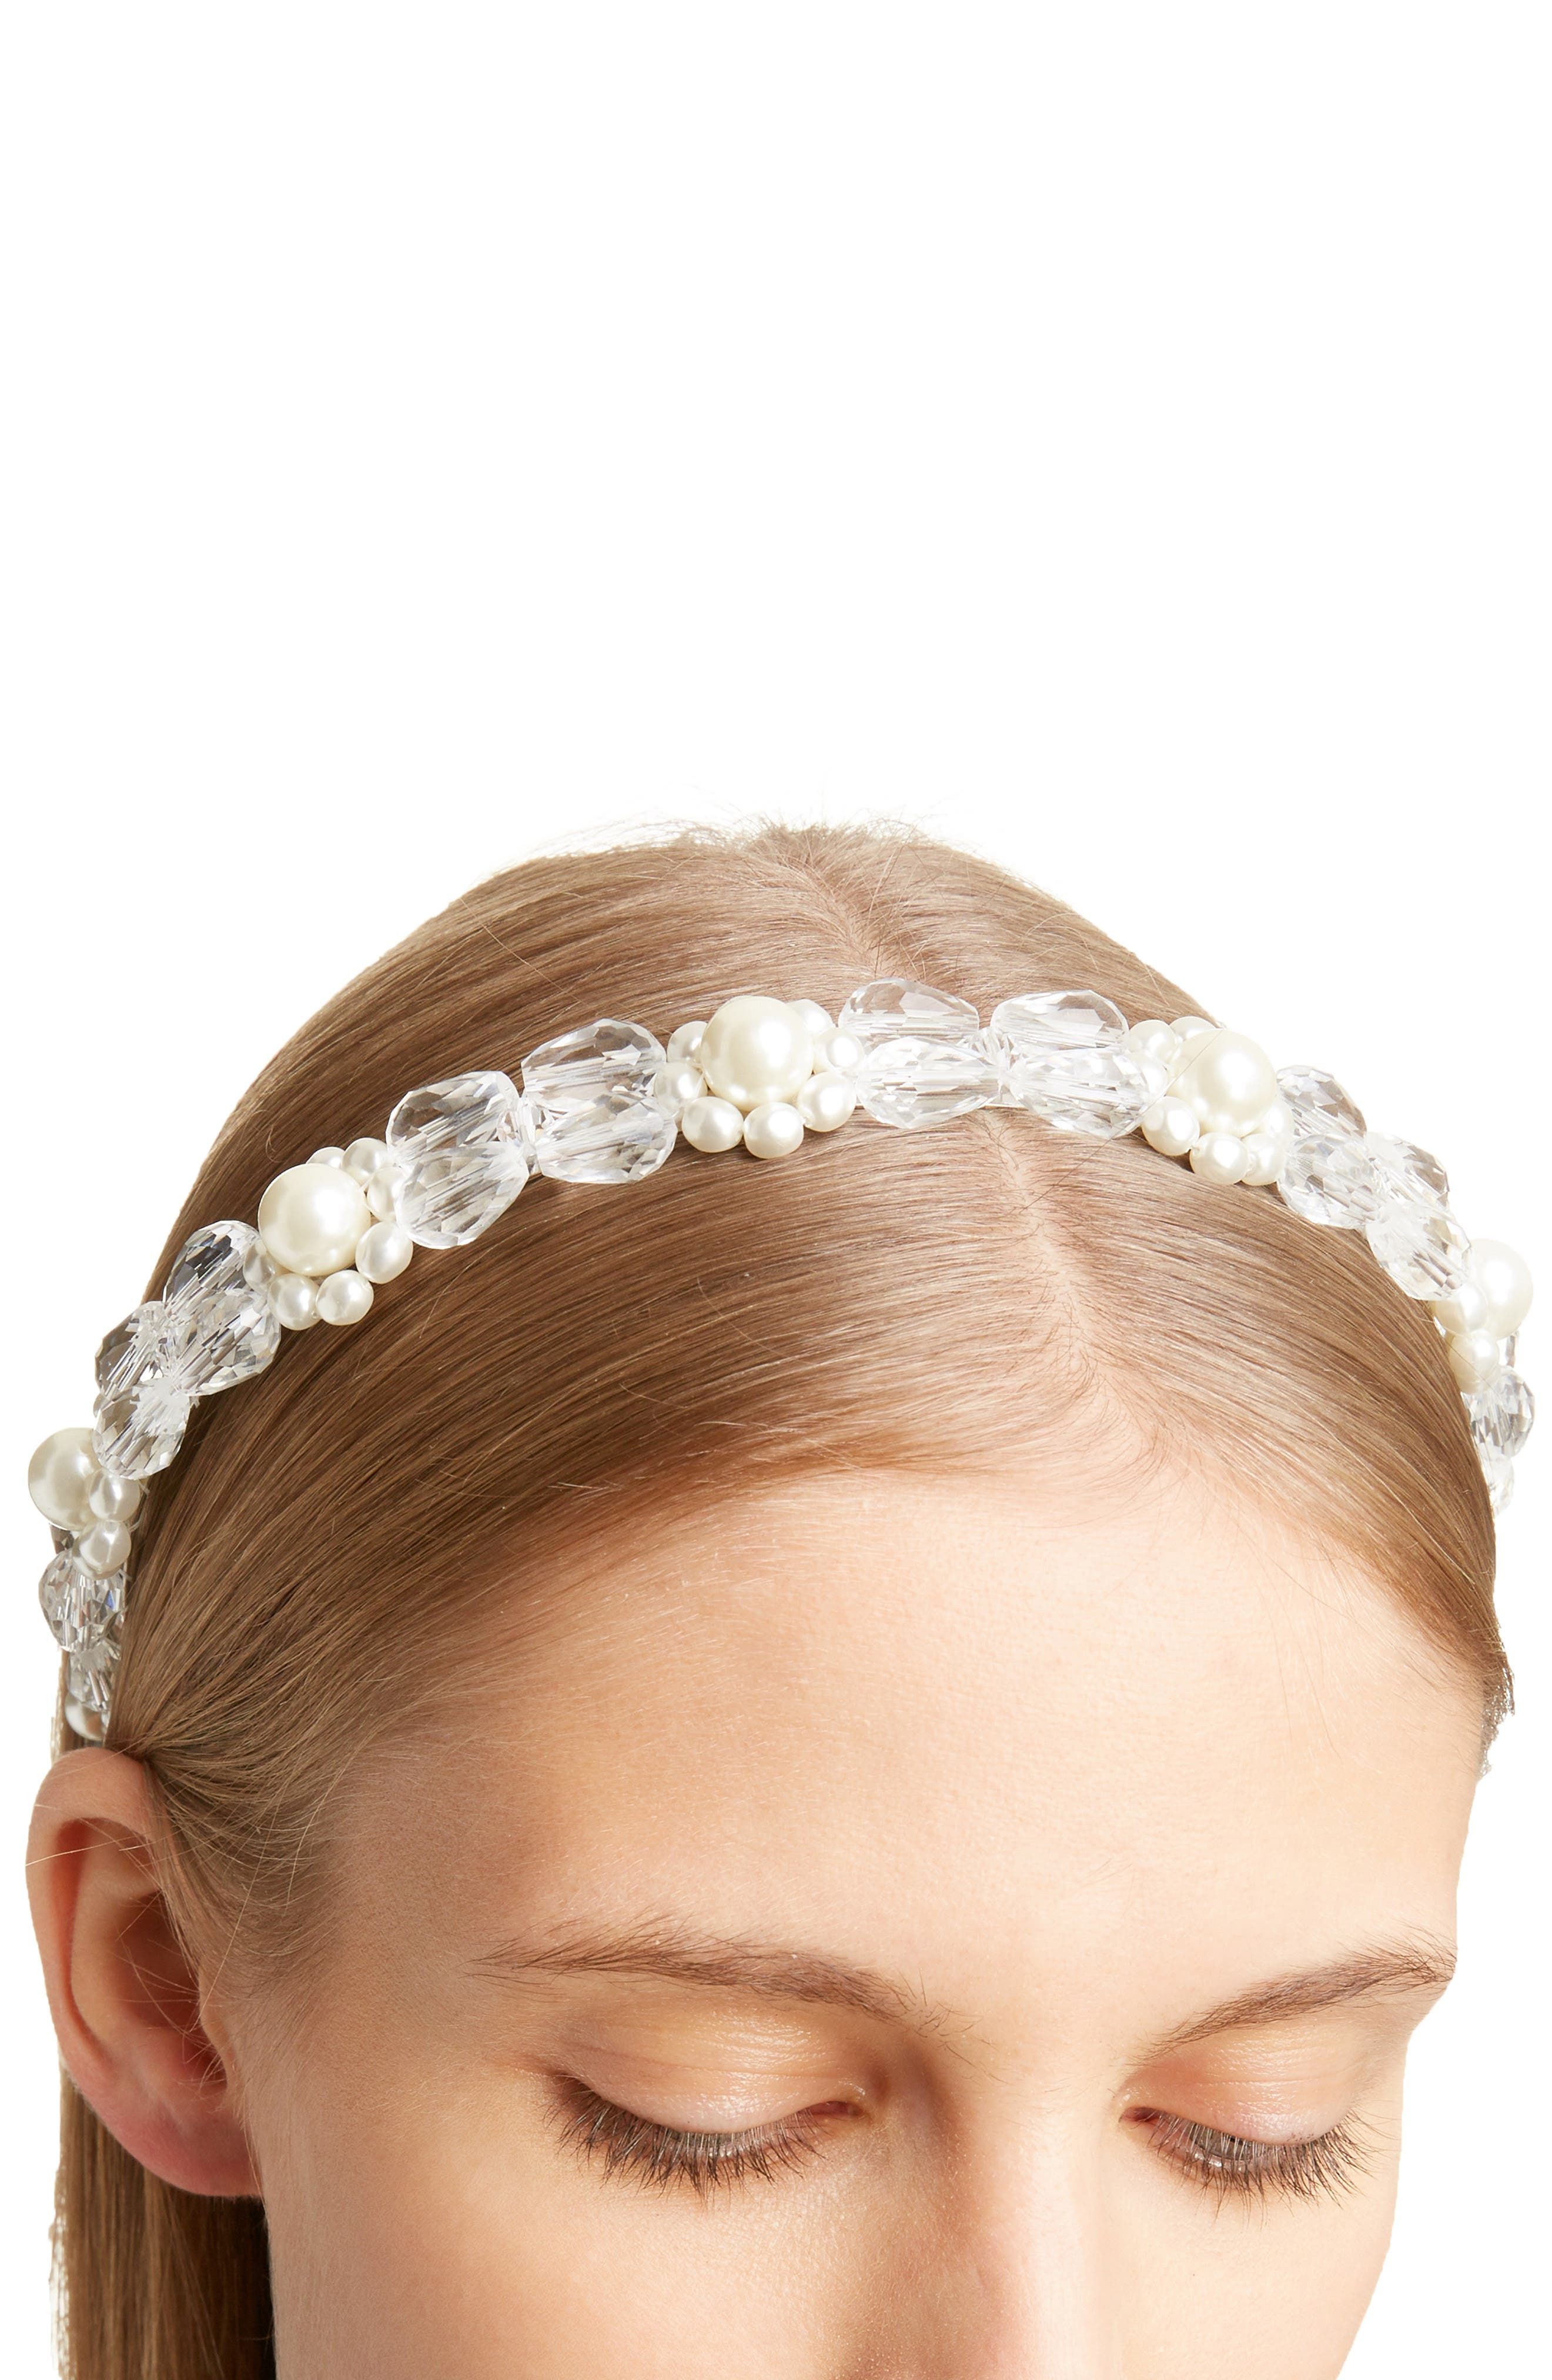 SIMONE ROCHA, Daisy Imitation Pearl & Crystal Headband, Alternate thumbnail 3, color, CLEAR/ PEARL